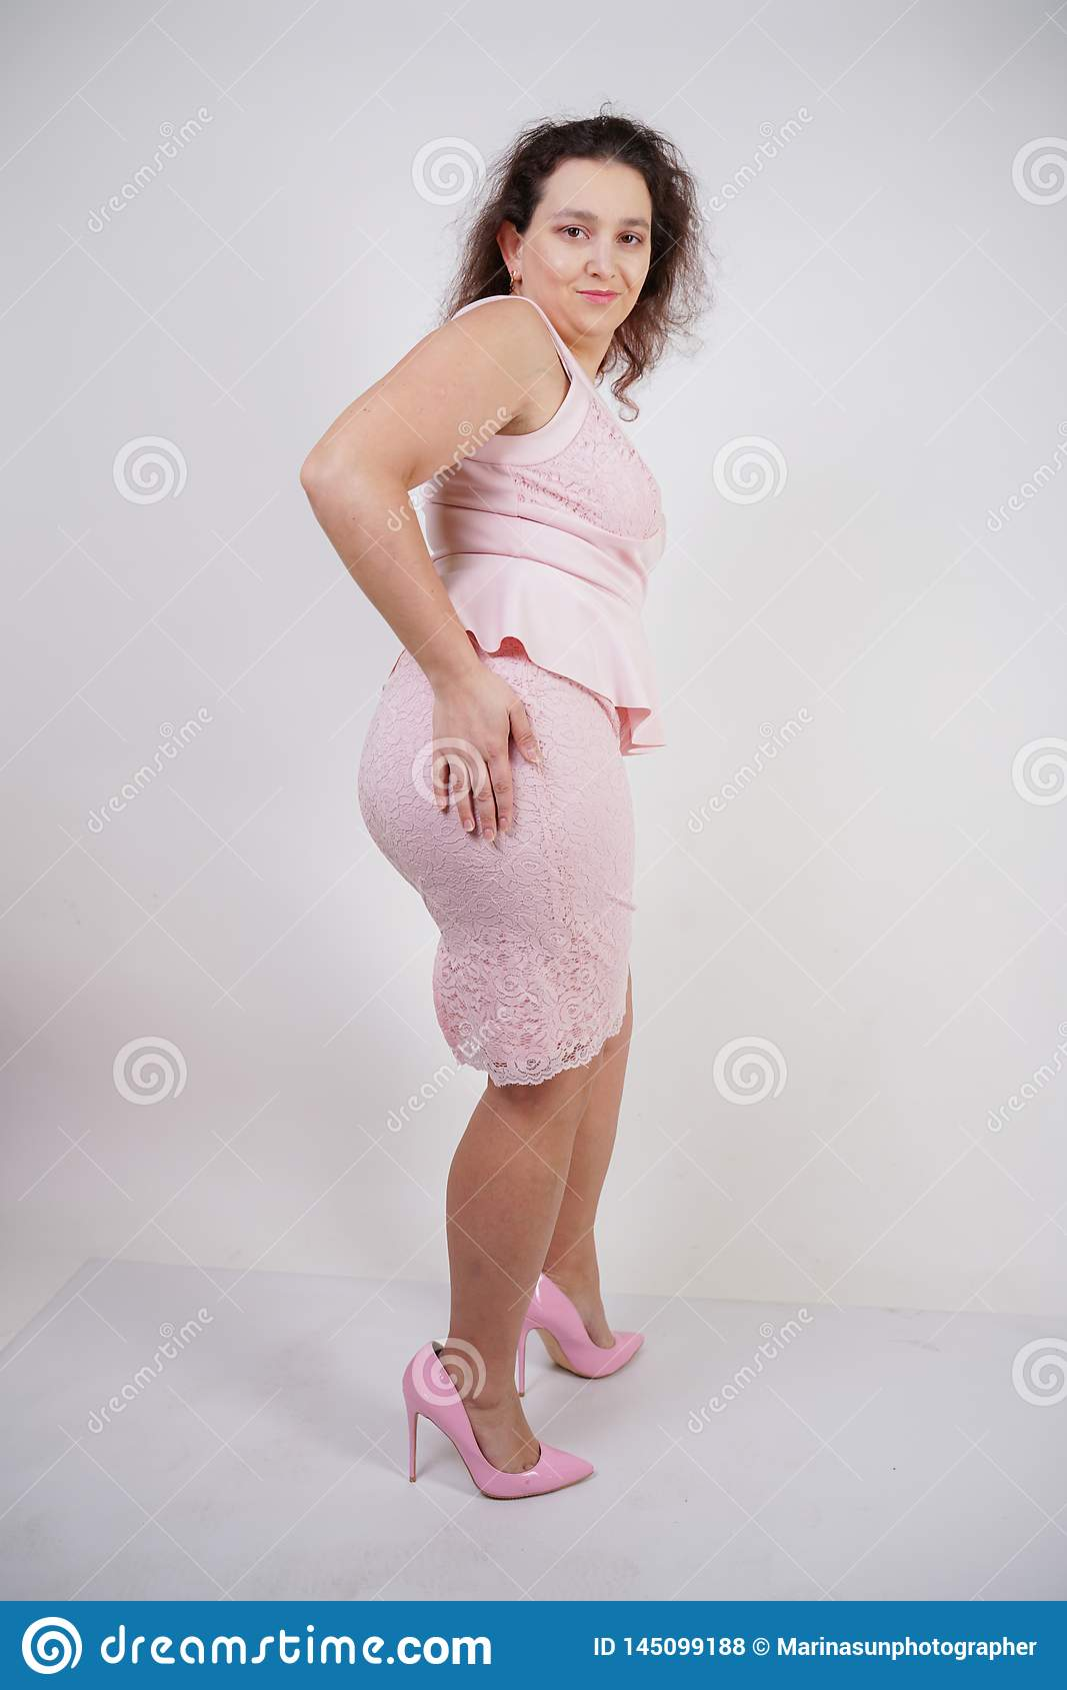 Vrij mollig positief meisje die in roze modieuze kleding op witte studioachtergrond dansen